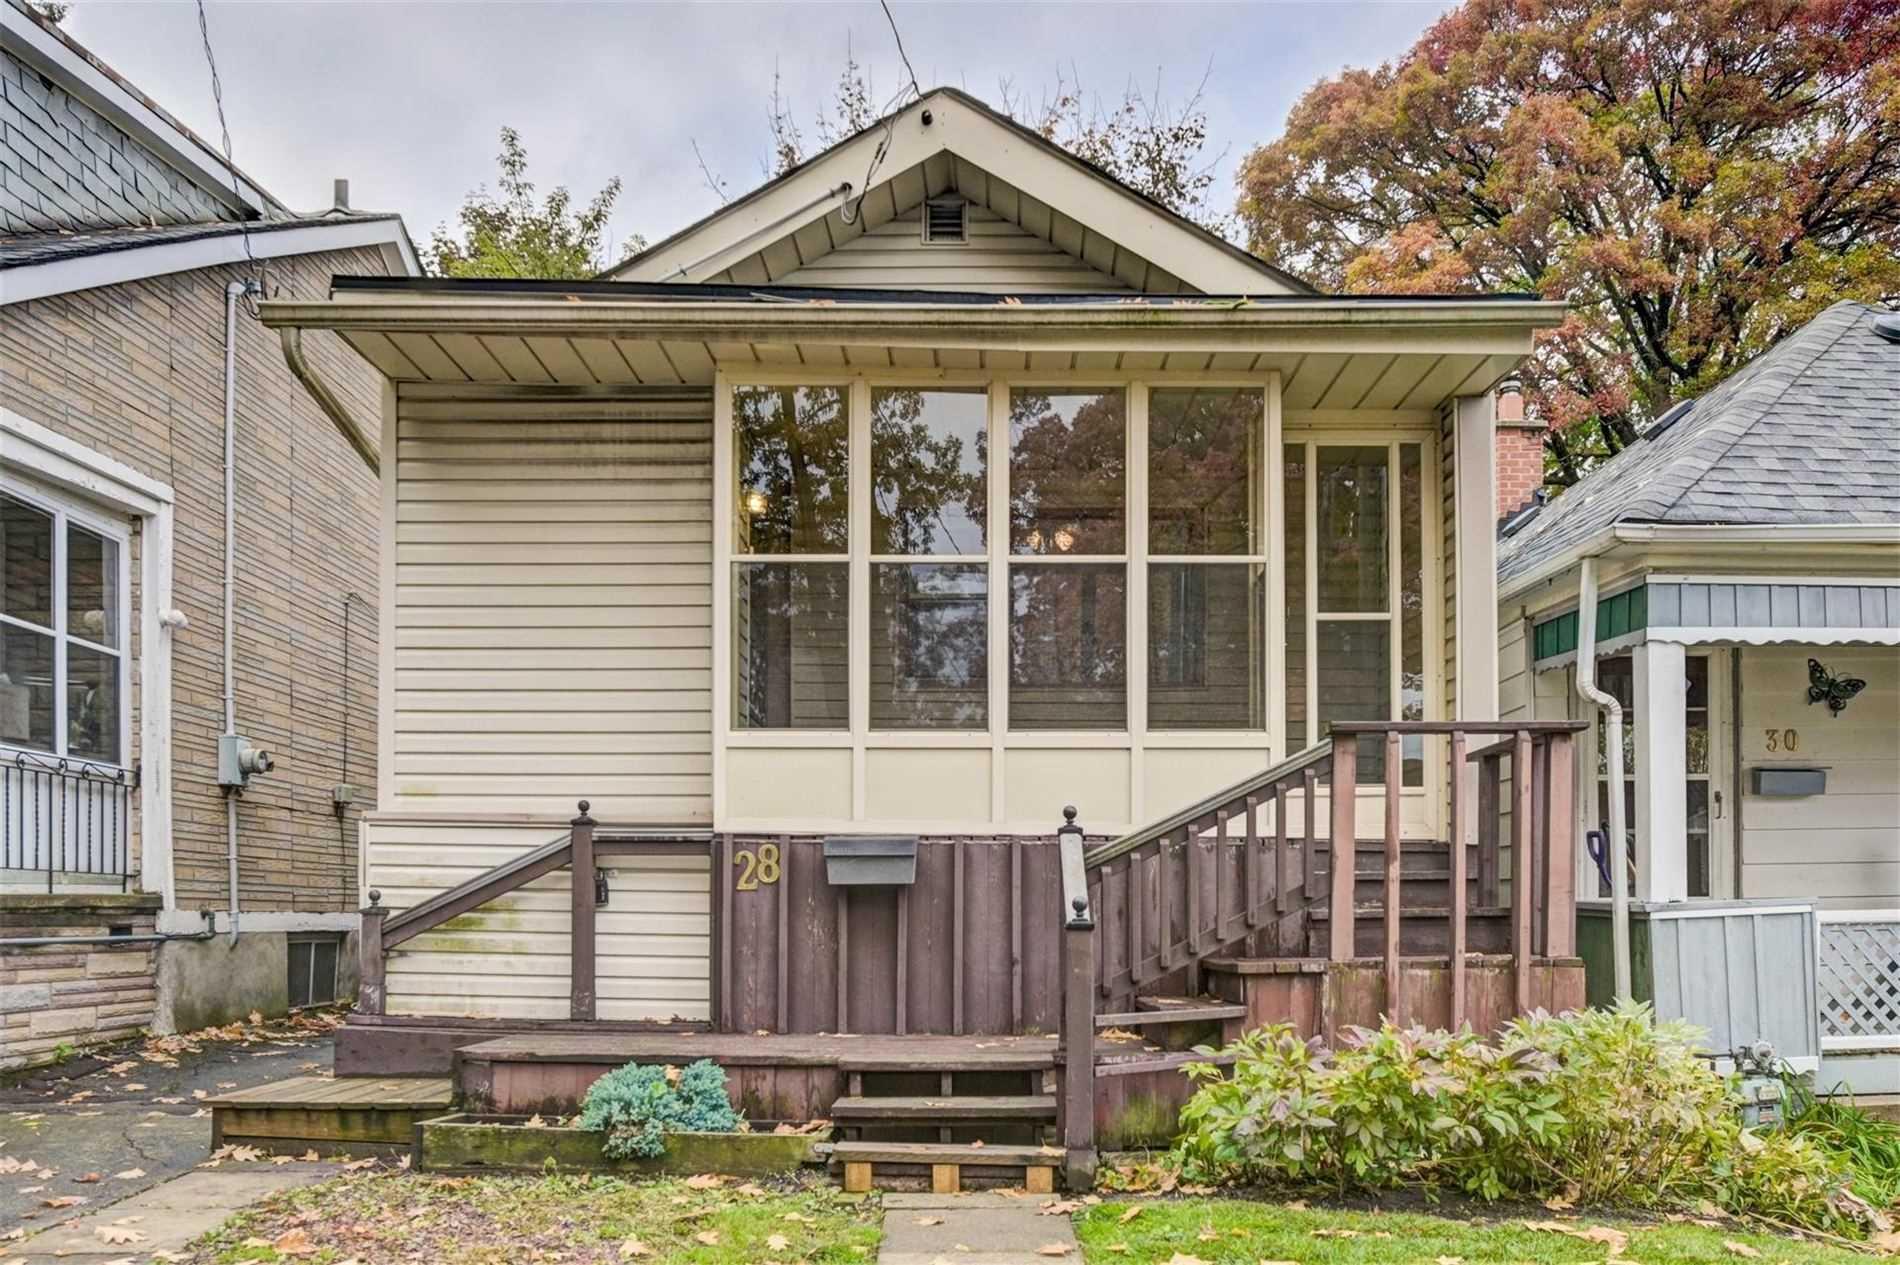 28 Kenworthy Ave, Toronto, Ontario M1L3B2, 2 Bedrooms Bedrooms, 5 Rooms Rooms,1 BathroomBathrooms,Detached,For Sale,Kenworthy,E4964616